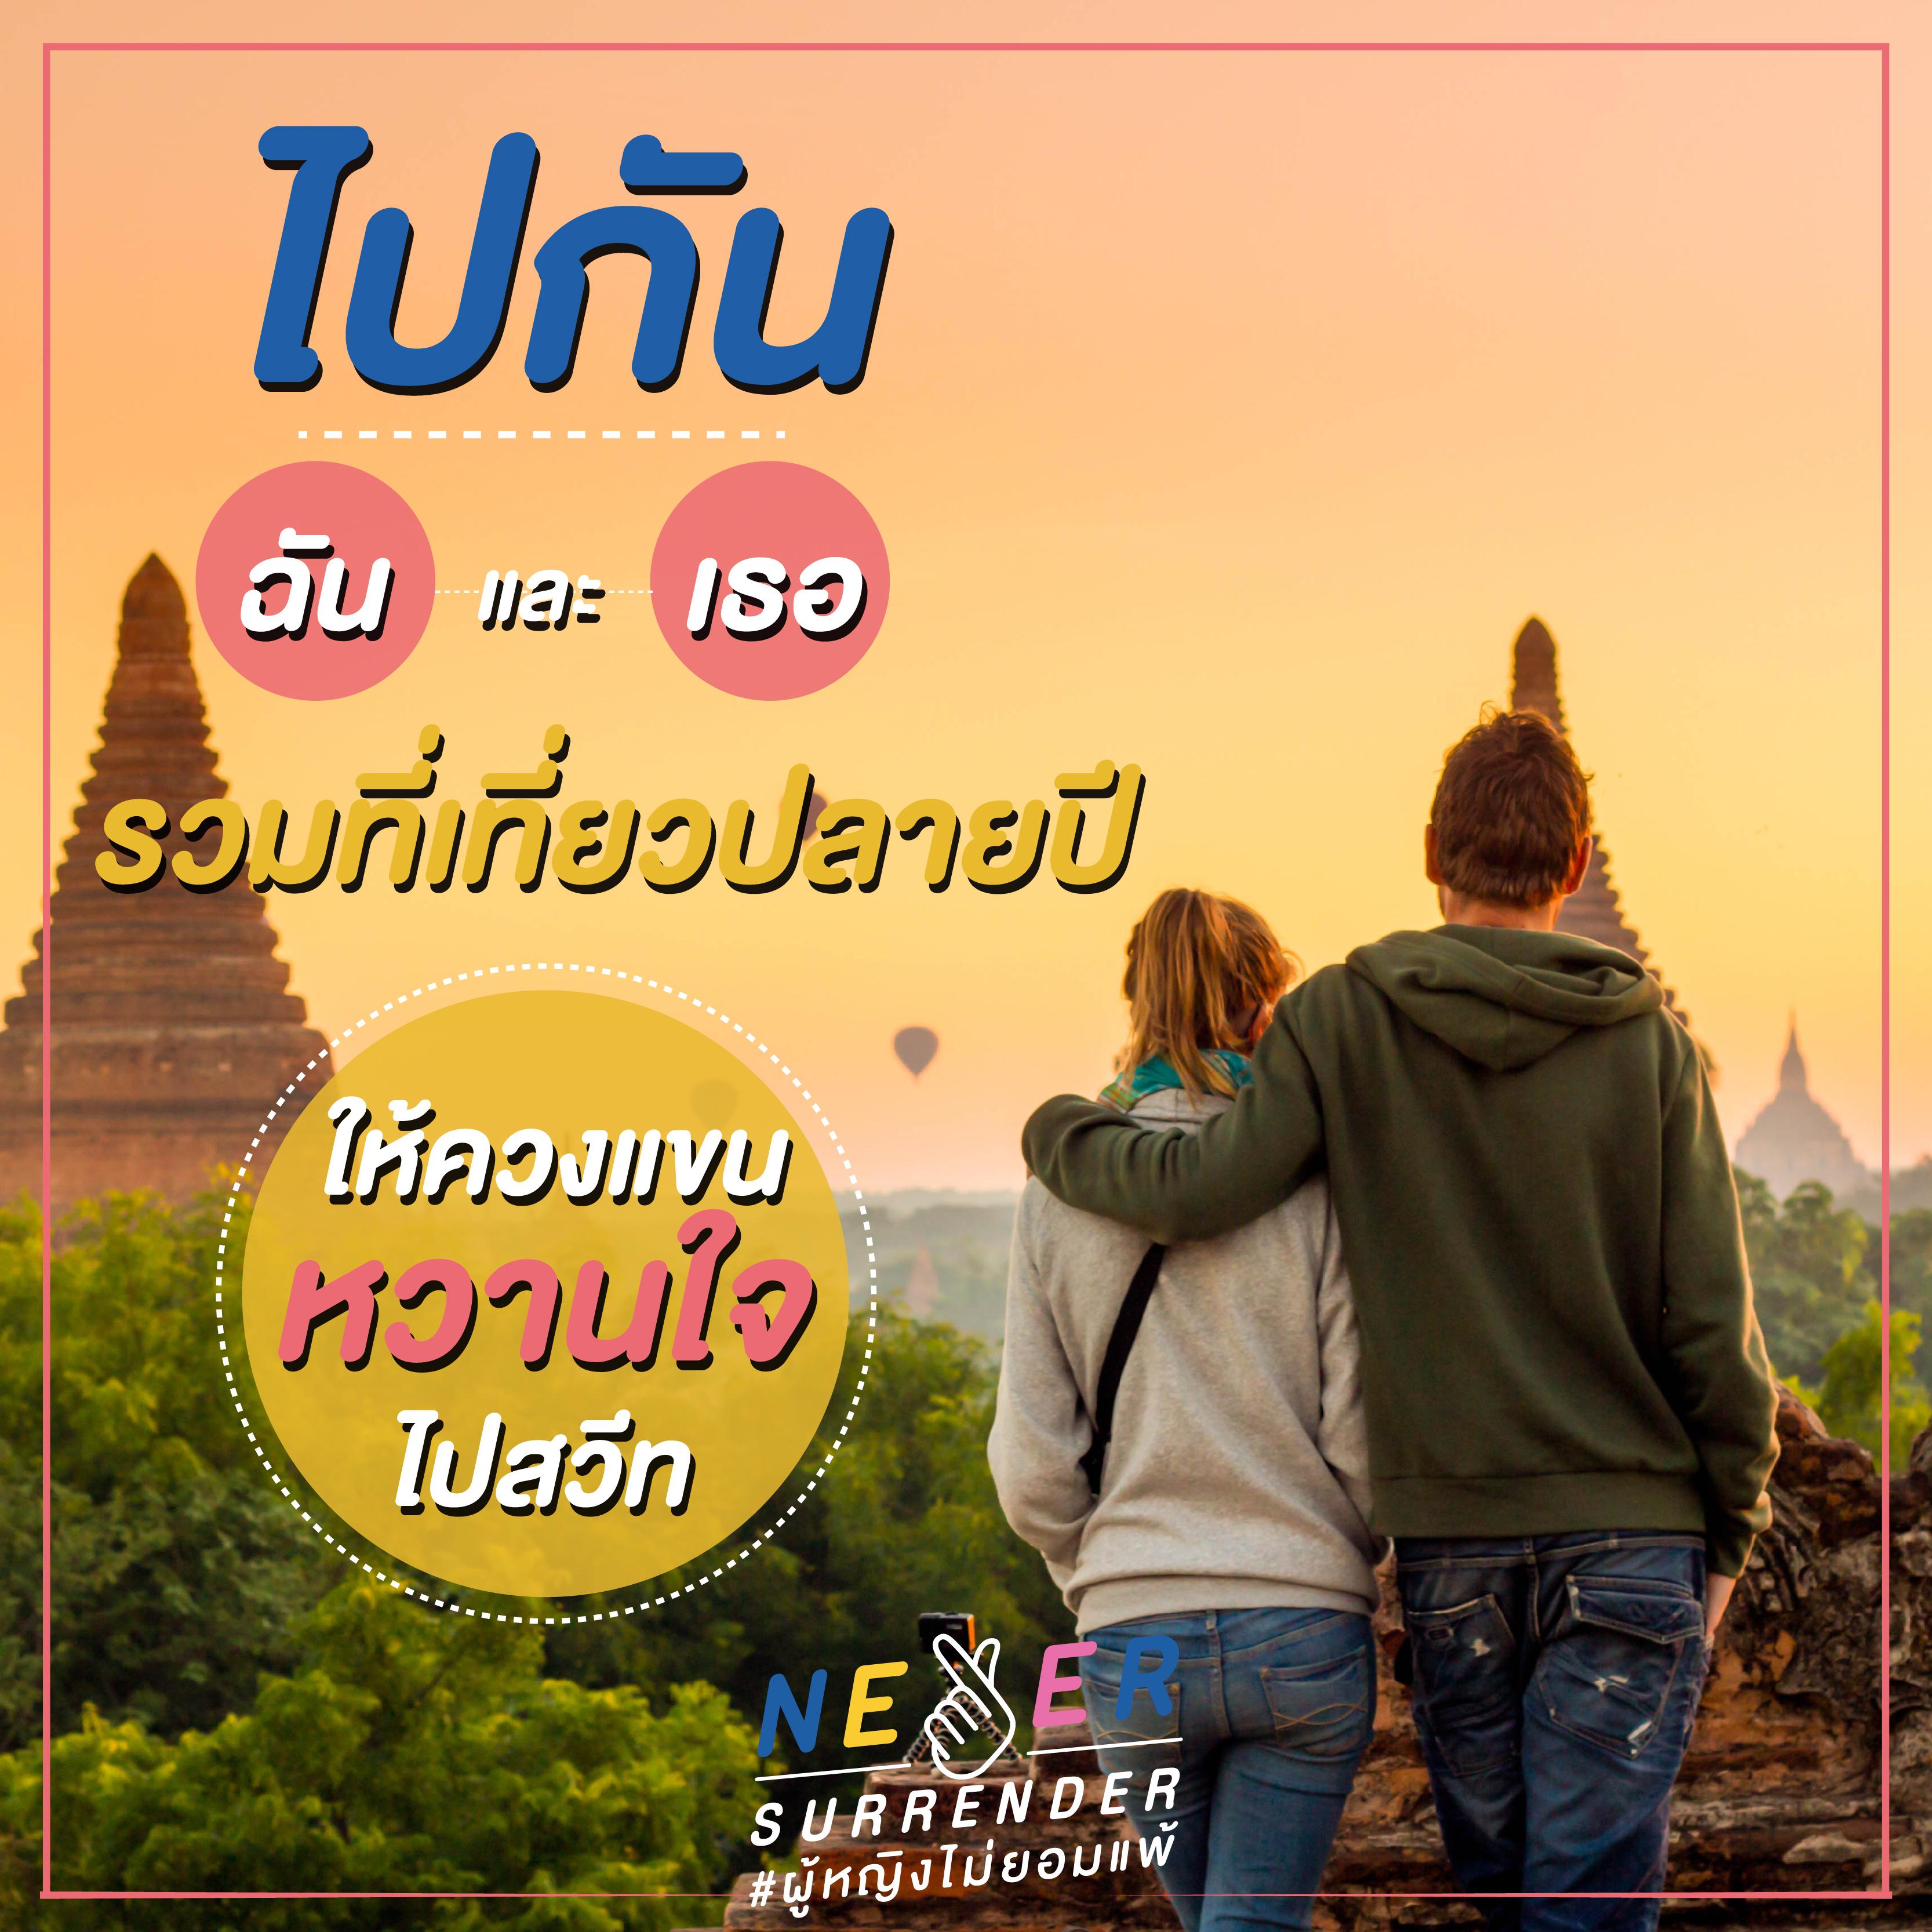 Never Surrender Thailand_ไปกันฉันและเธอ รวมที่เที่ยวปลายปีให้ควงแขนหวานใจไปสวีท